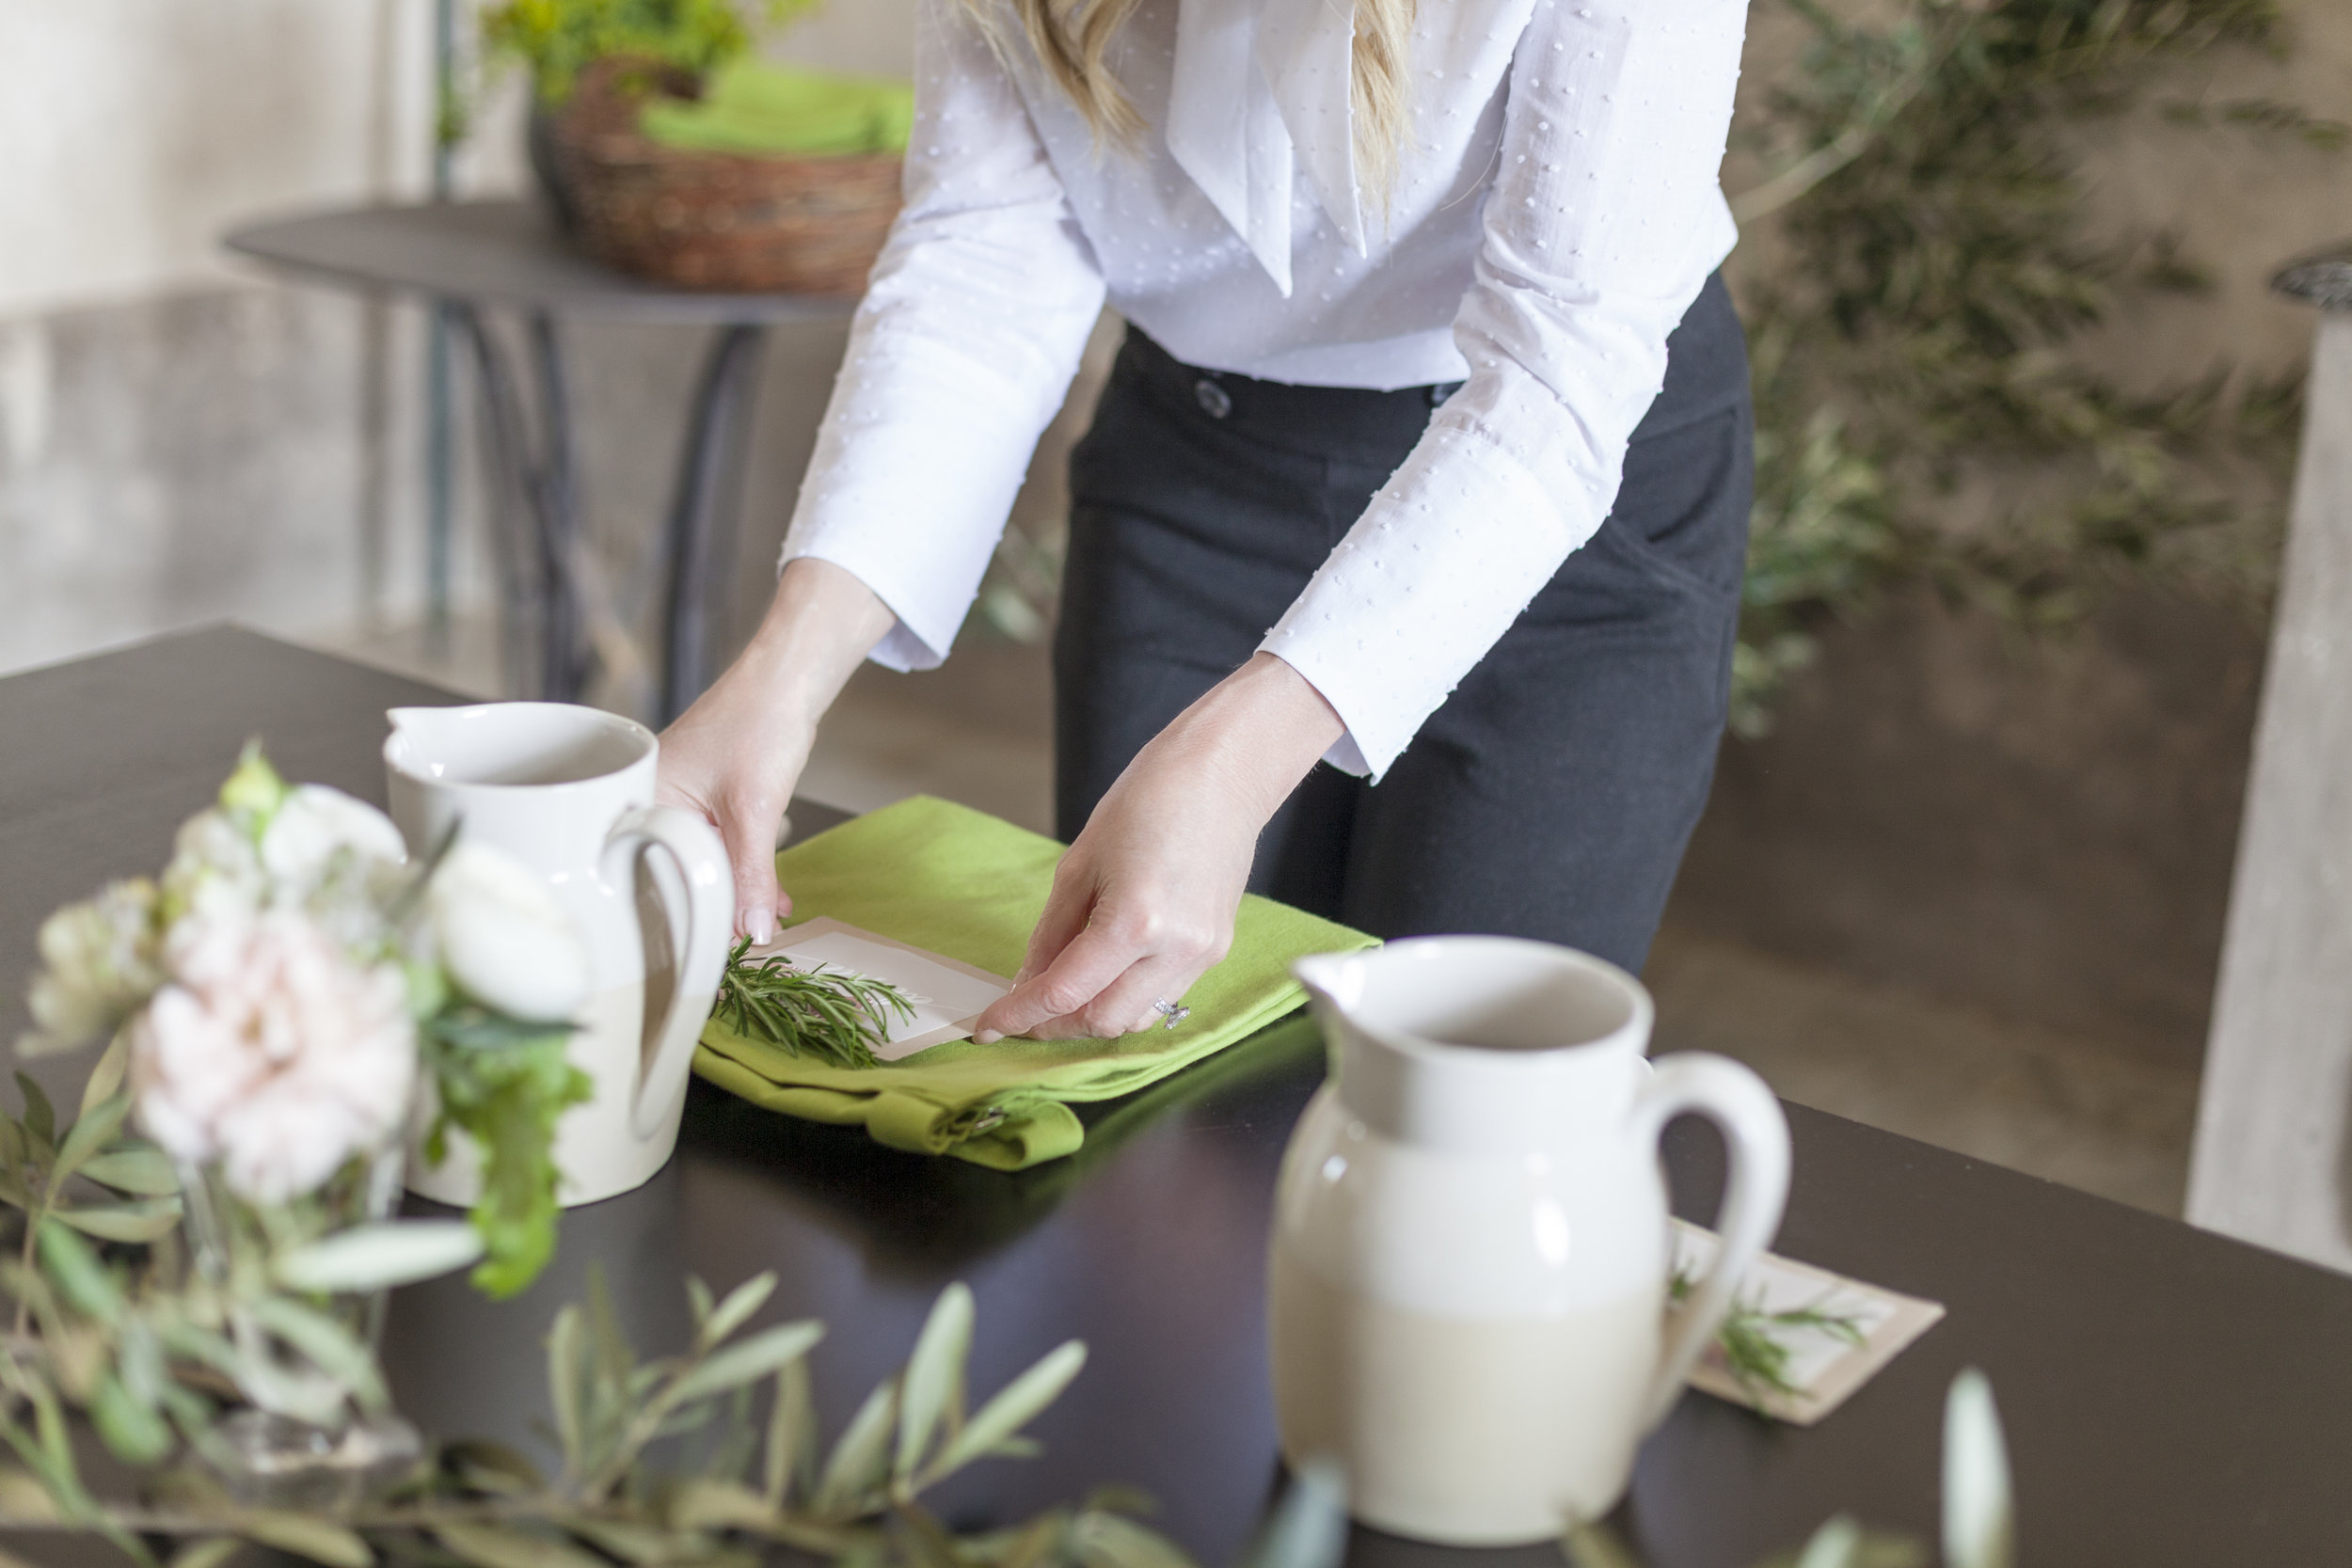 lesfleurs andover france flower workshop sandra sigman french shopping trip antique ironstone pitcher